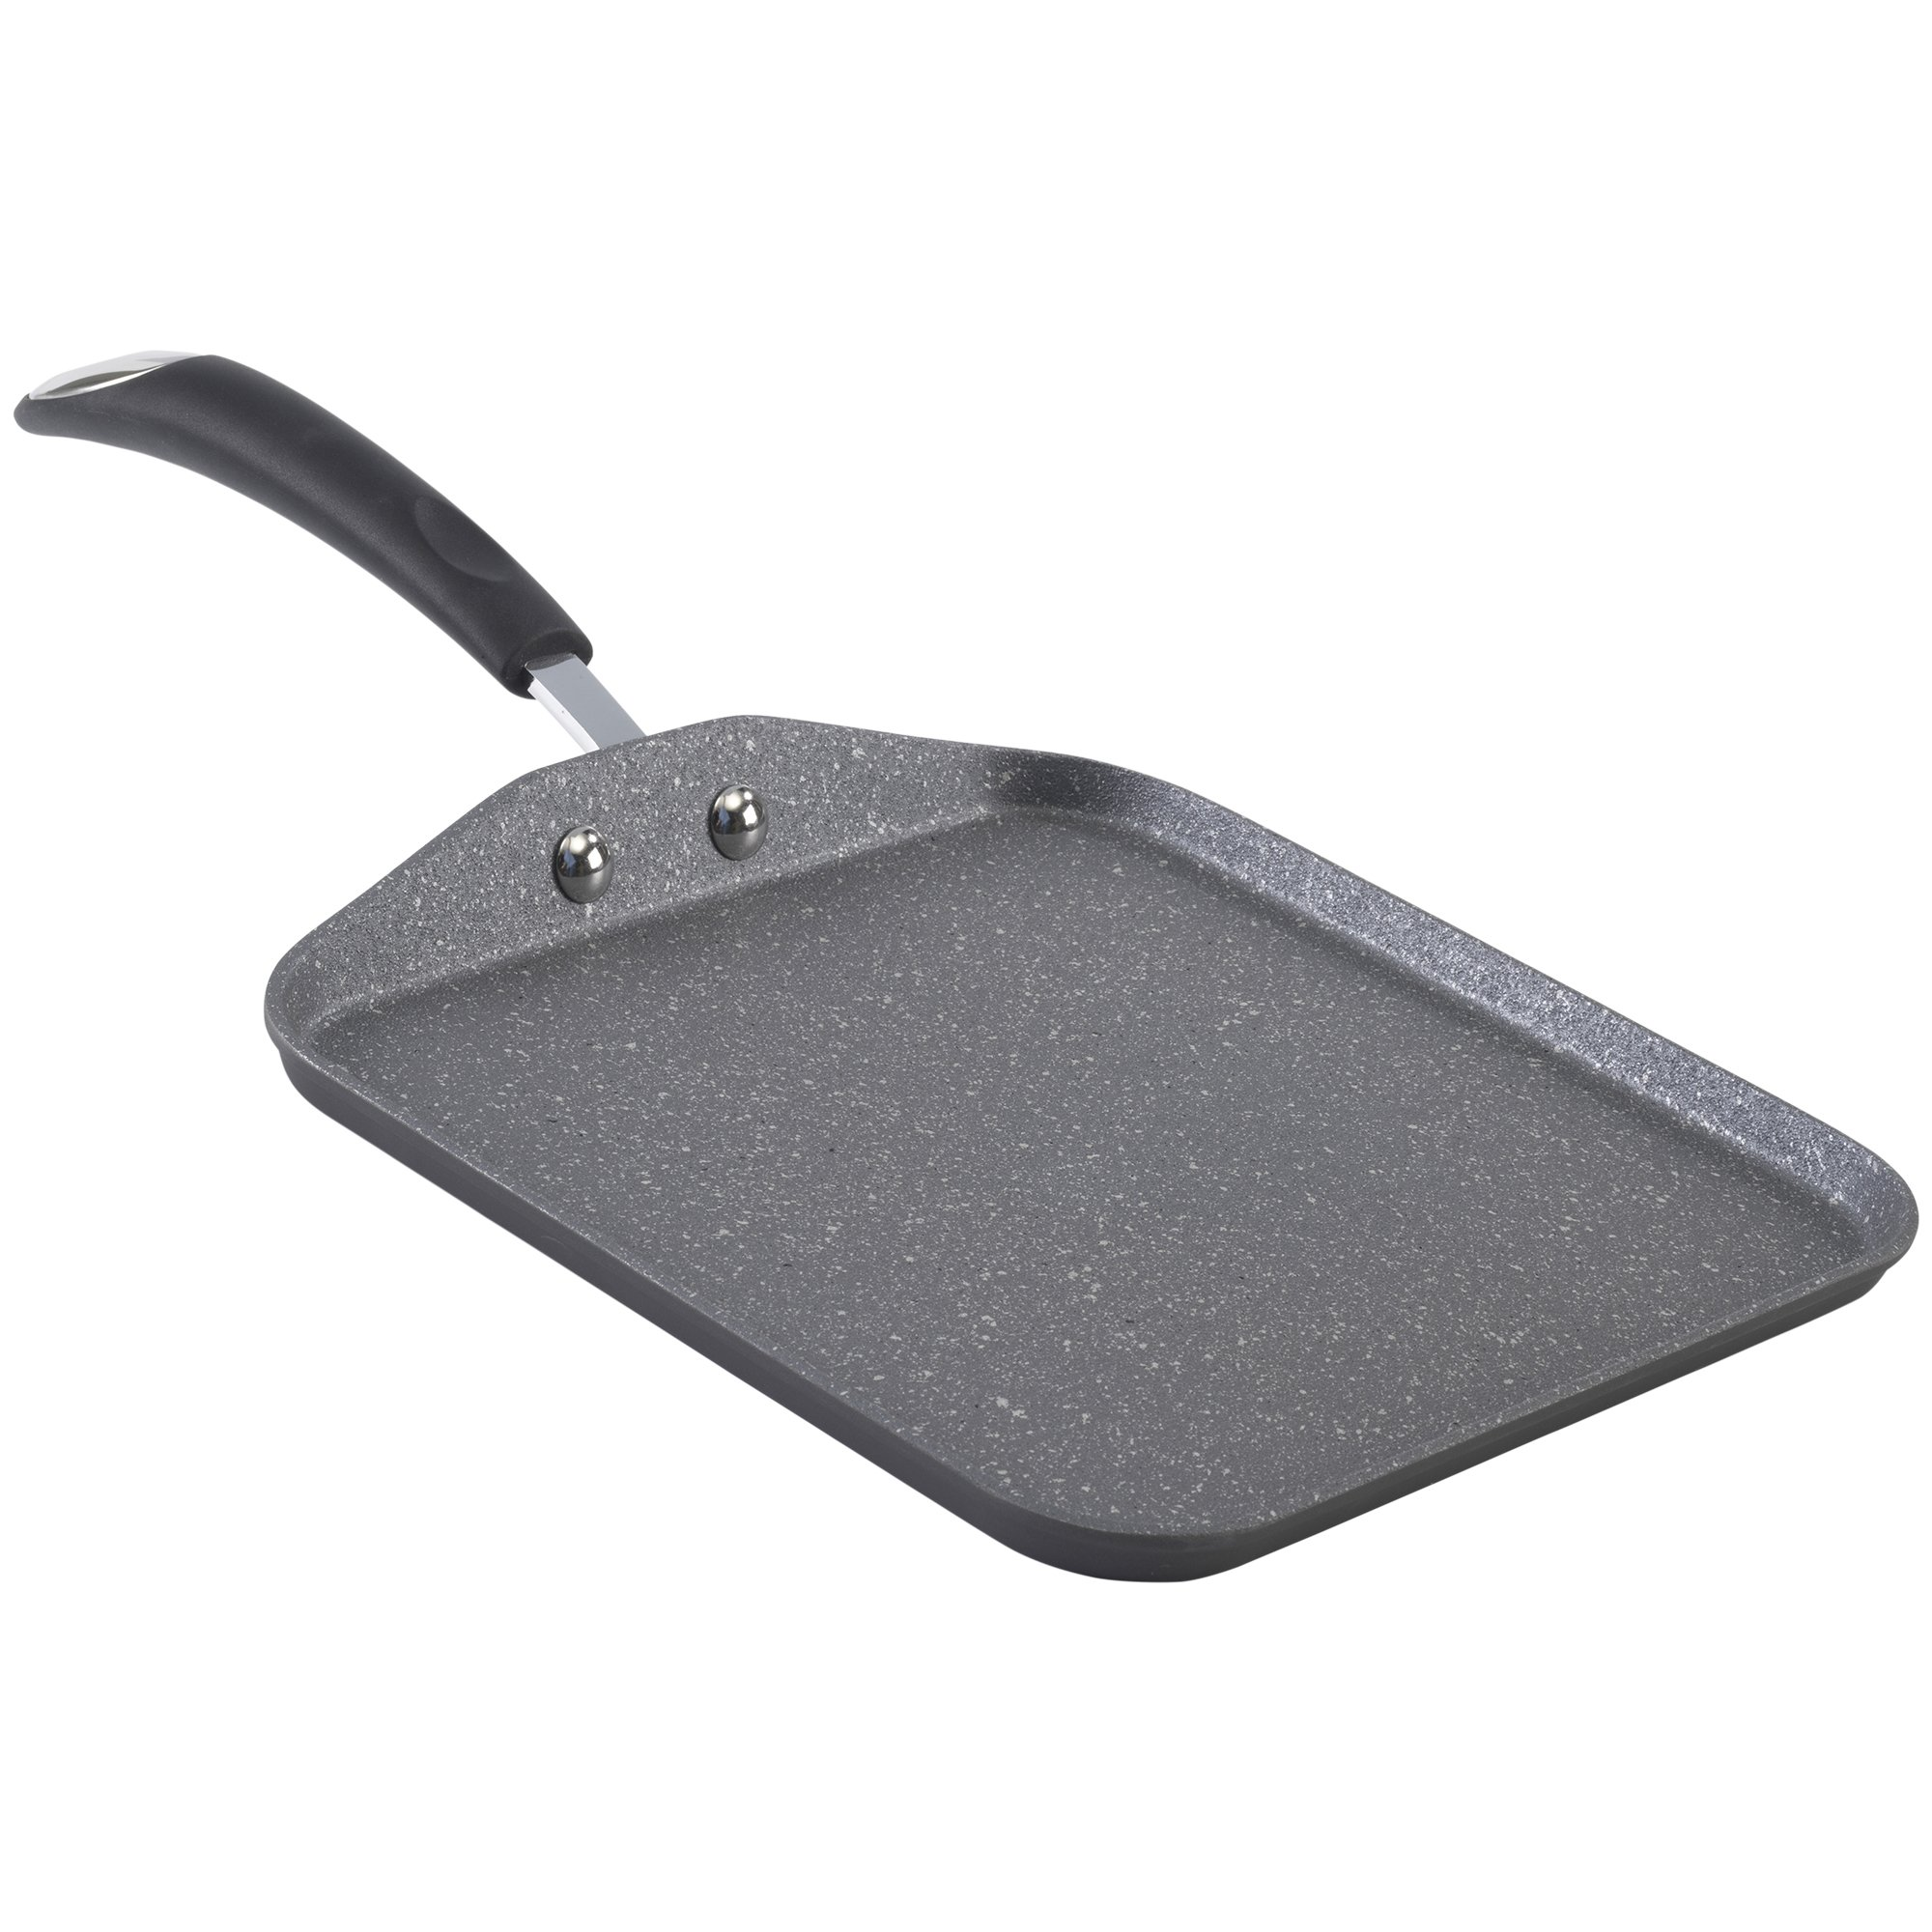 Bialetti Nonstick Impact 10 inch square griddle